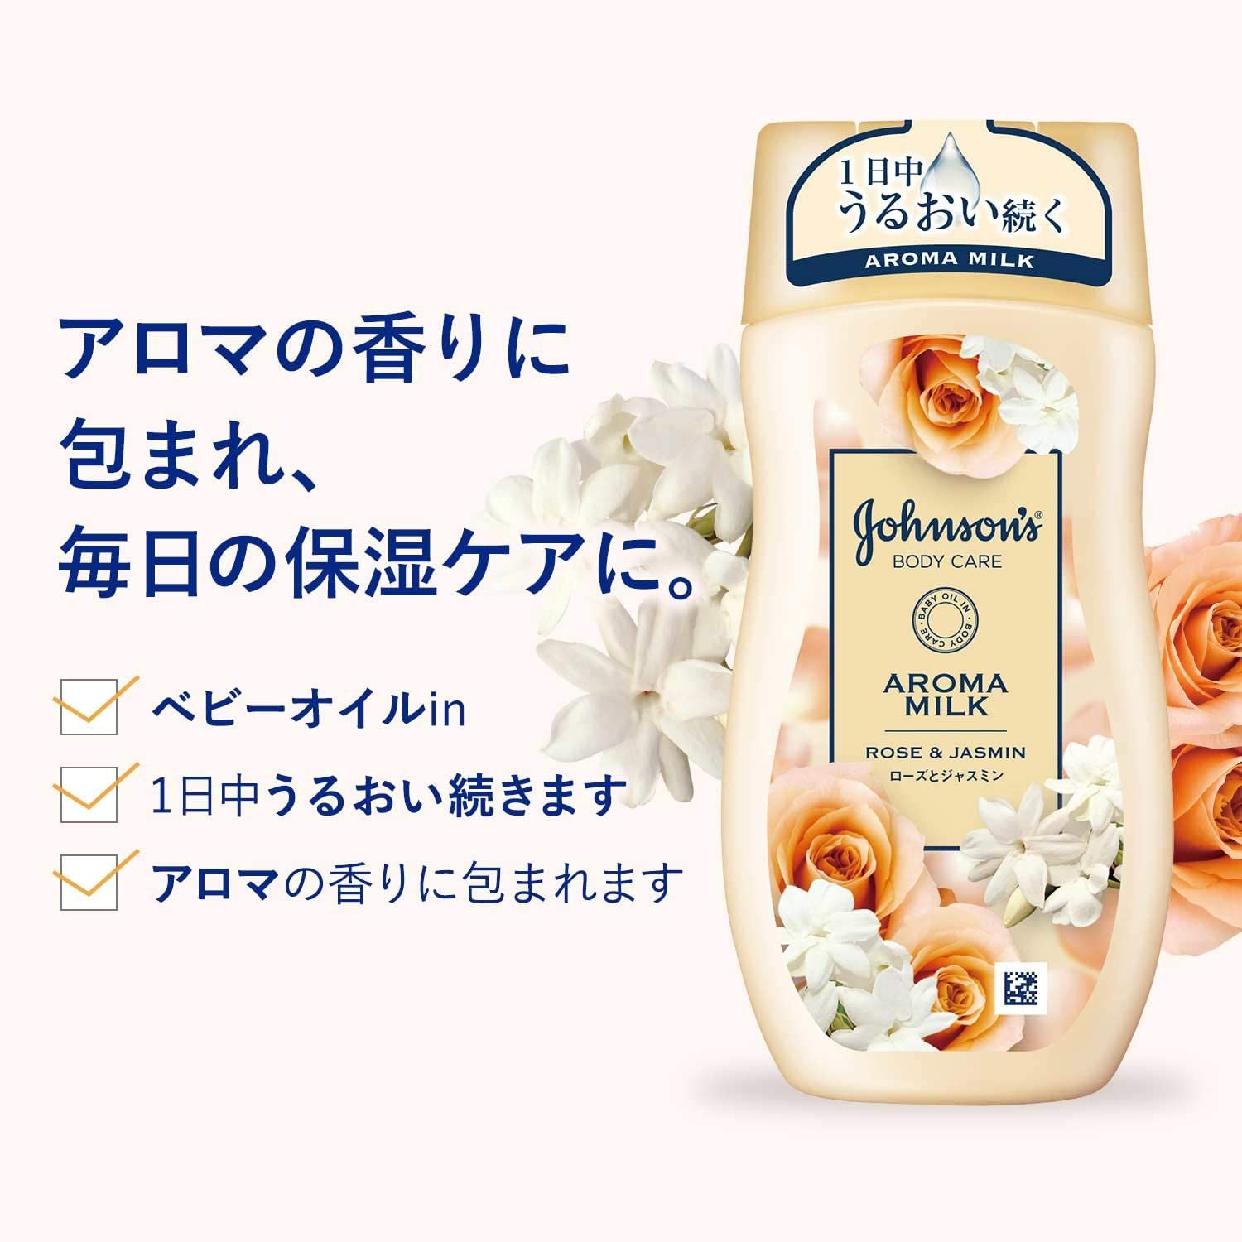 Johnson's BODY CARE(ジョンソン ボディケア)エクストラケア アロマミルクの商品画像3